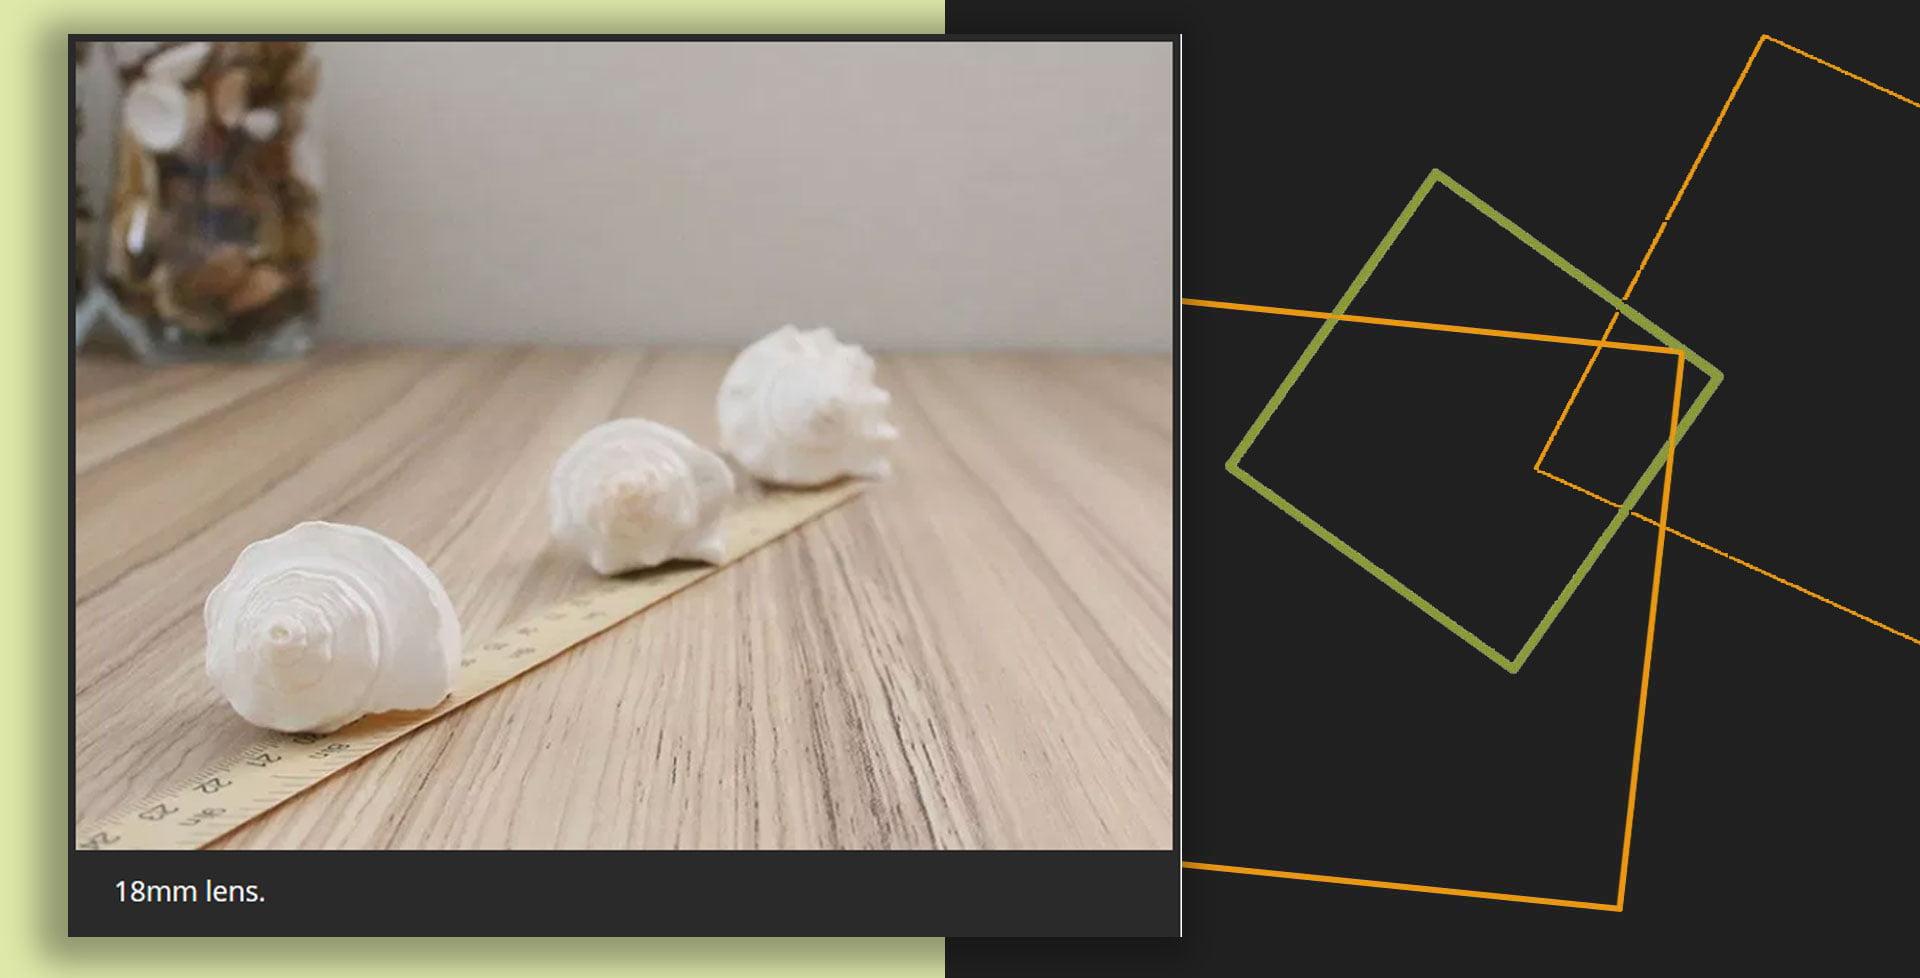 Still life Subjects  Understand Focal  Lengths9pg 2 - نحوه استفاده از سوژههای طبیعت بیجان برای درک فاصله کانونی